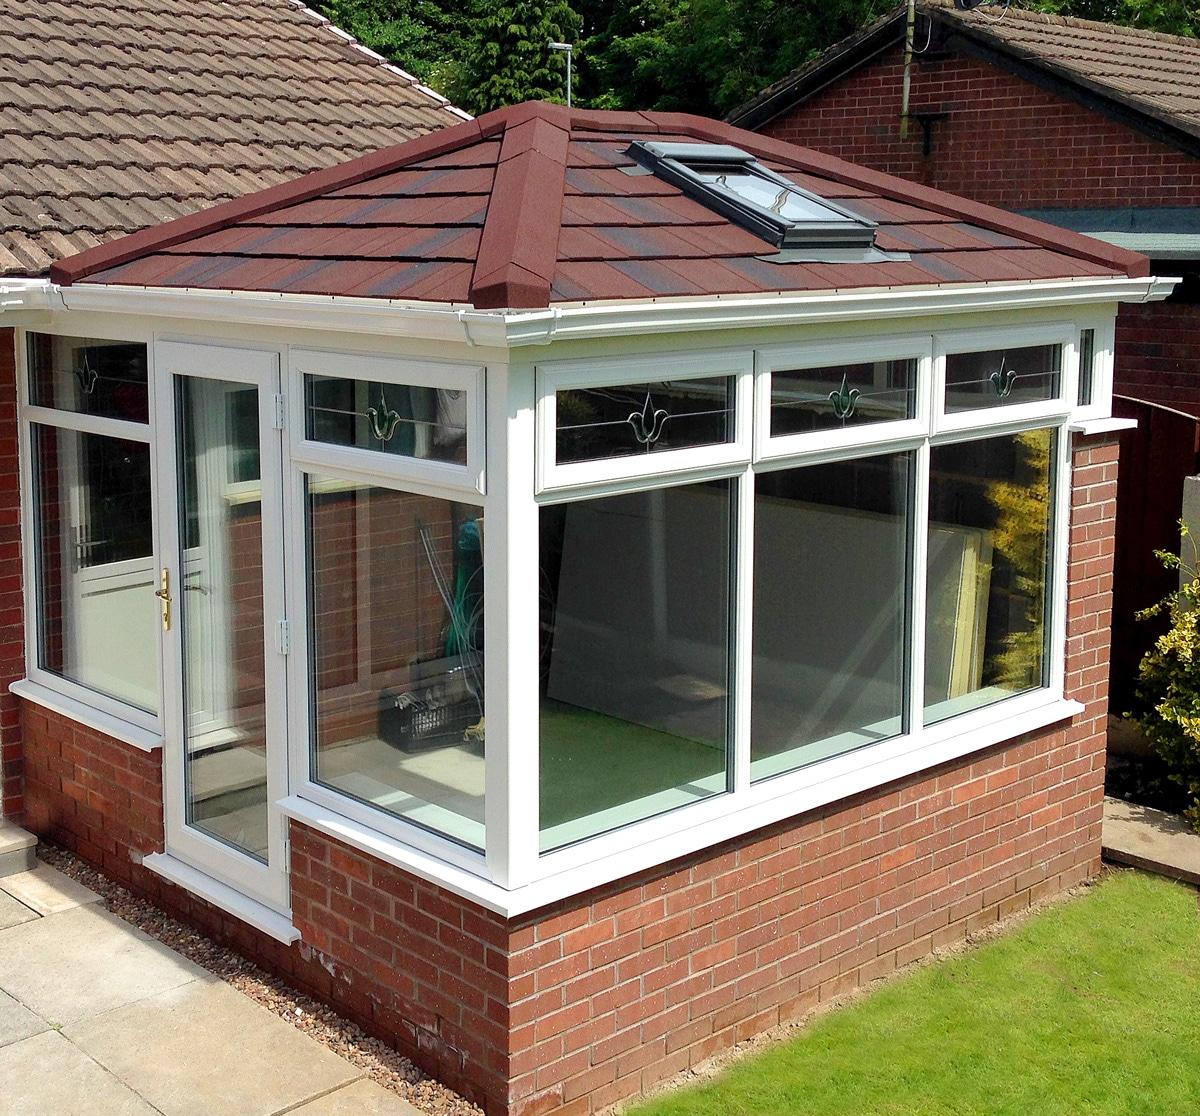 lightweight tiled roof